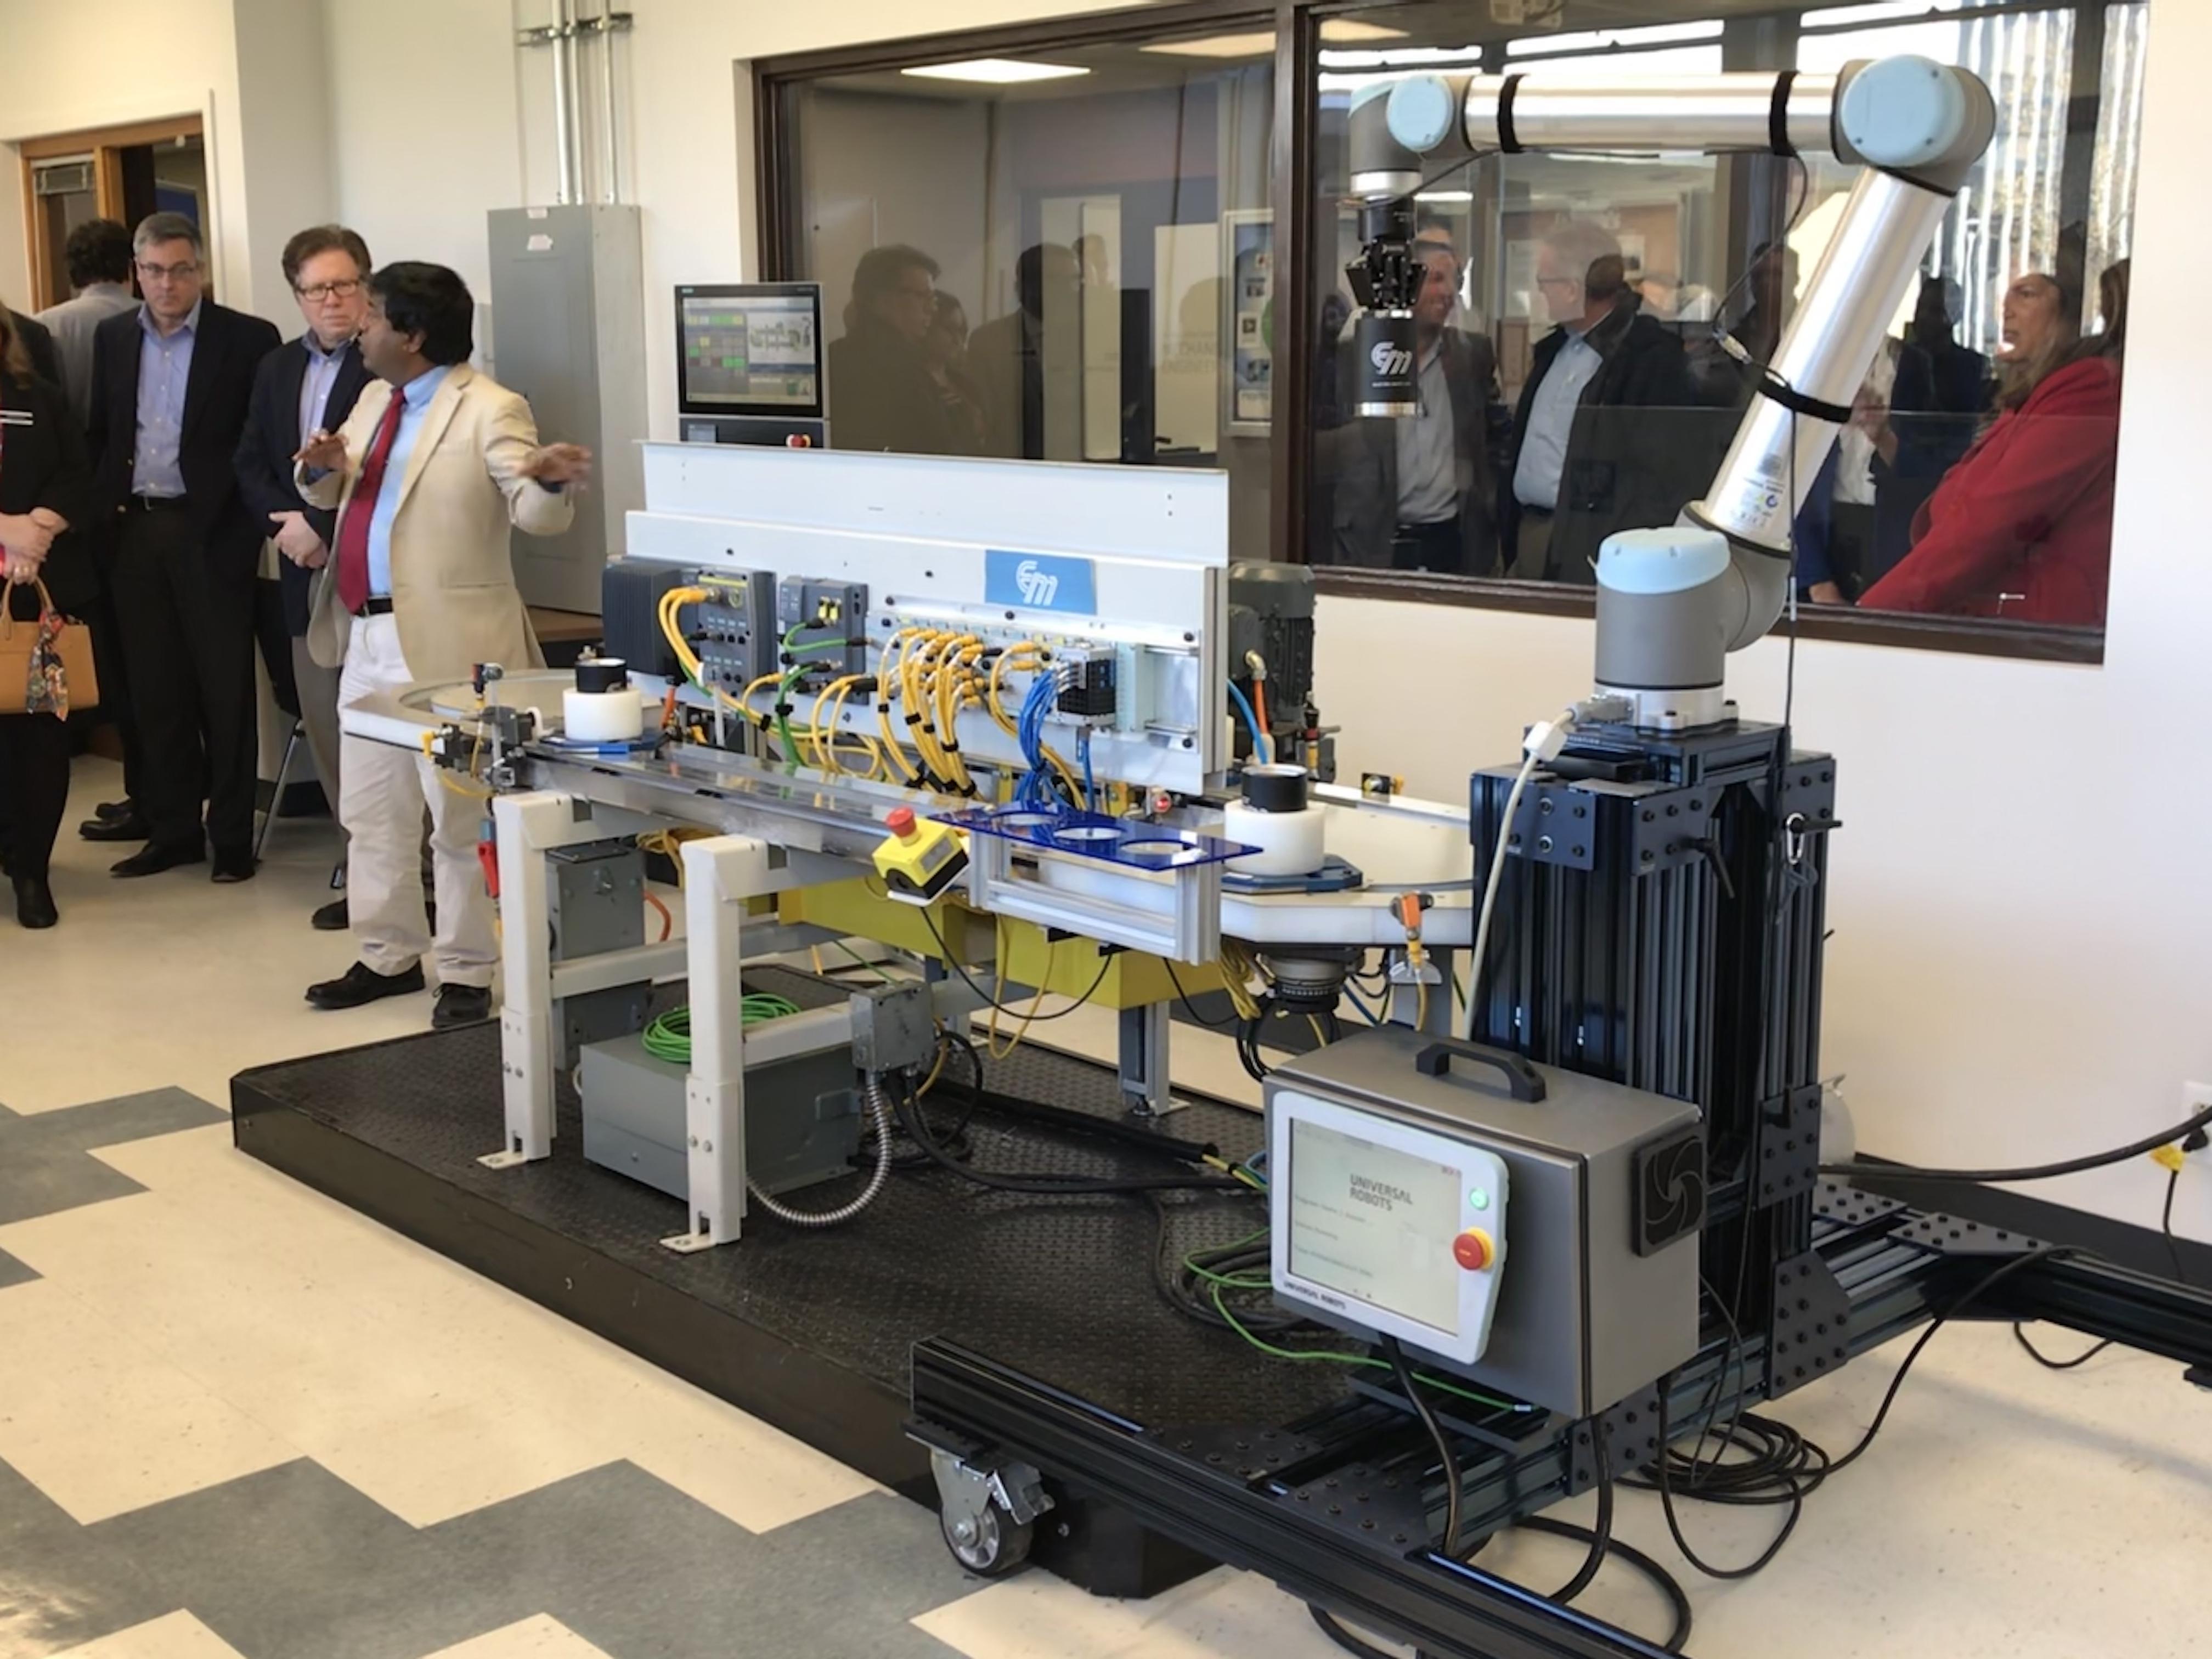 Siemens Electro-Matic Industrial Engineering Lab Opens on LTU Campus